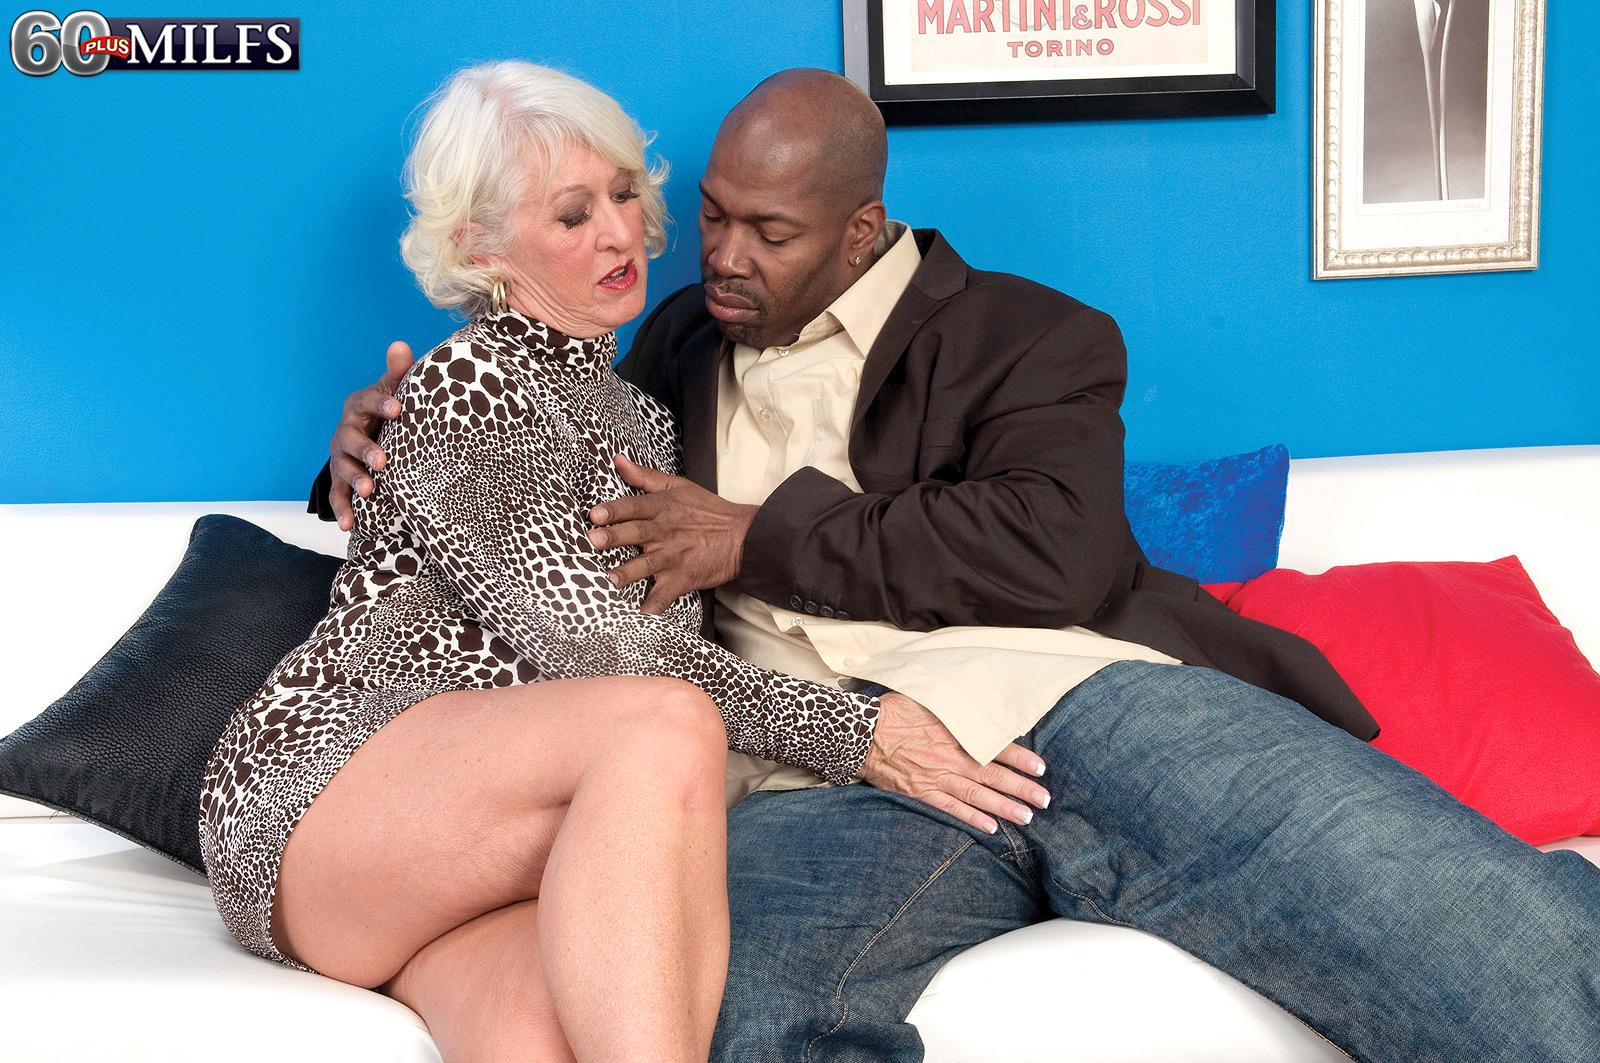 lou plus jeannie Granny 60